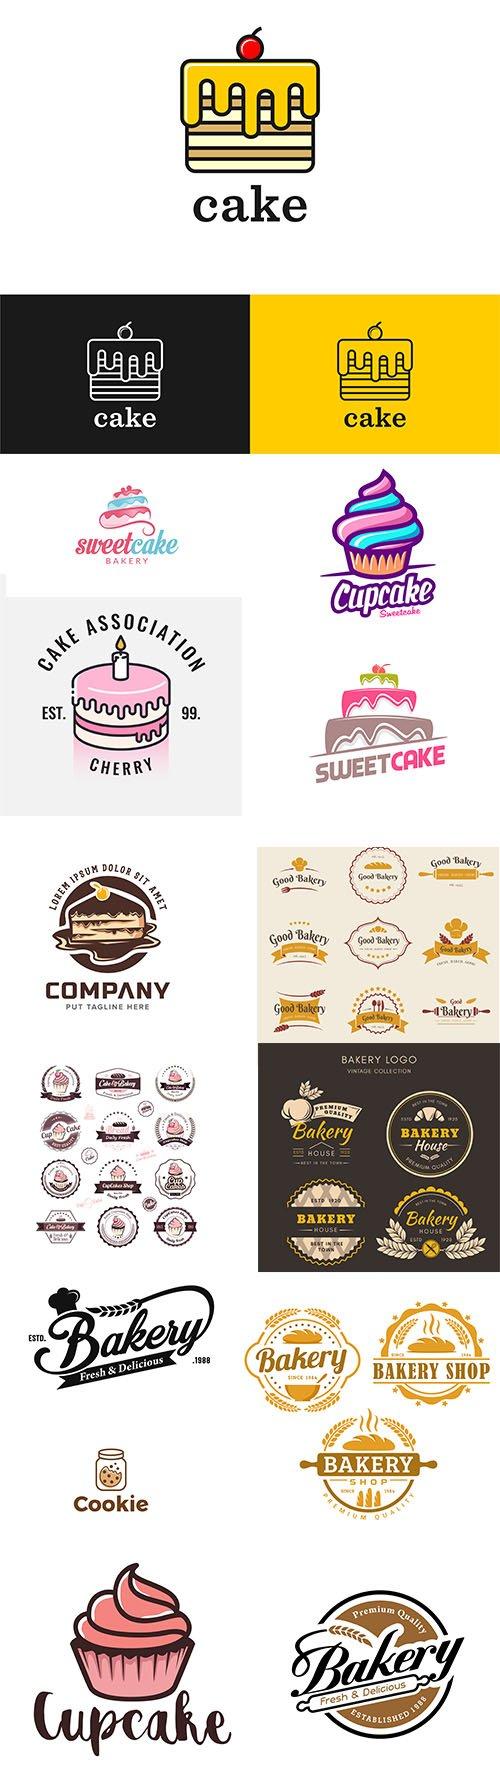 Bakery cake logo template collection vol 2